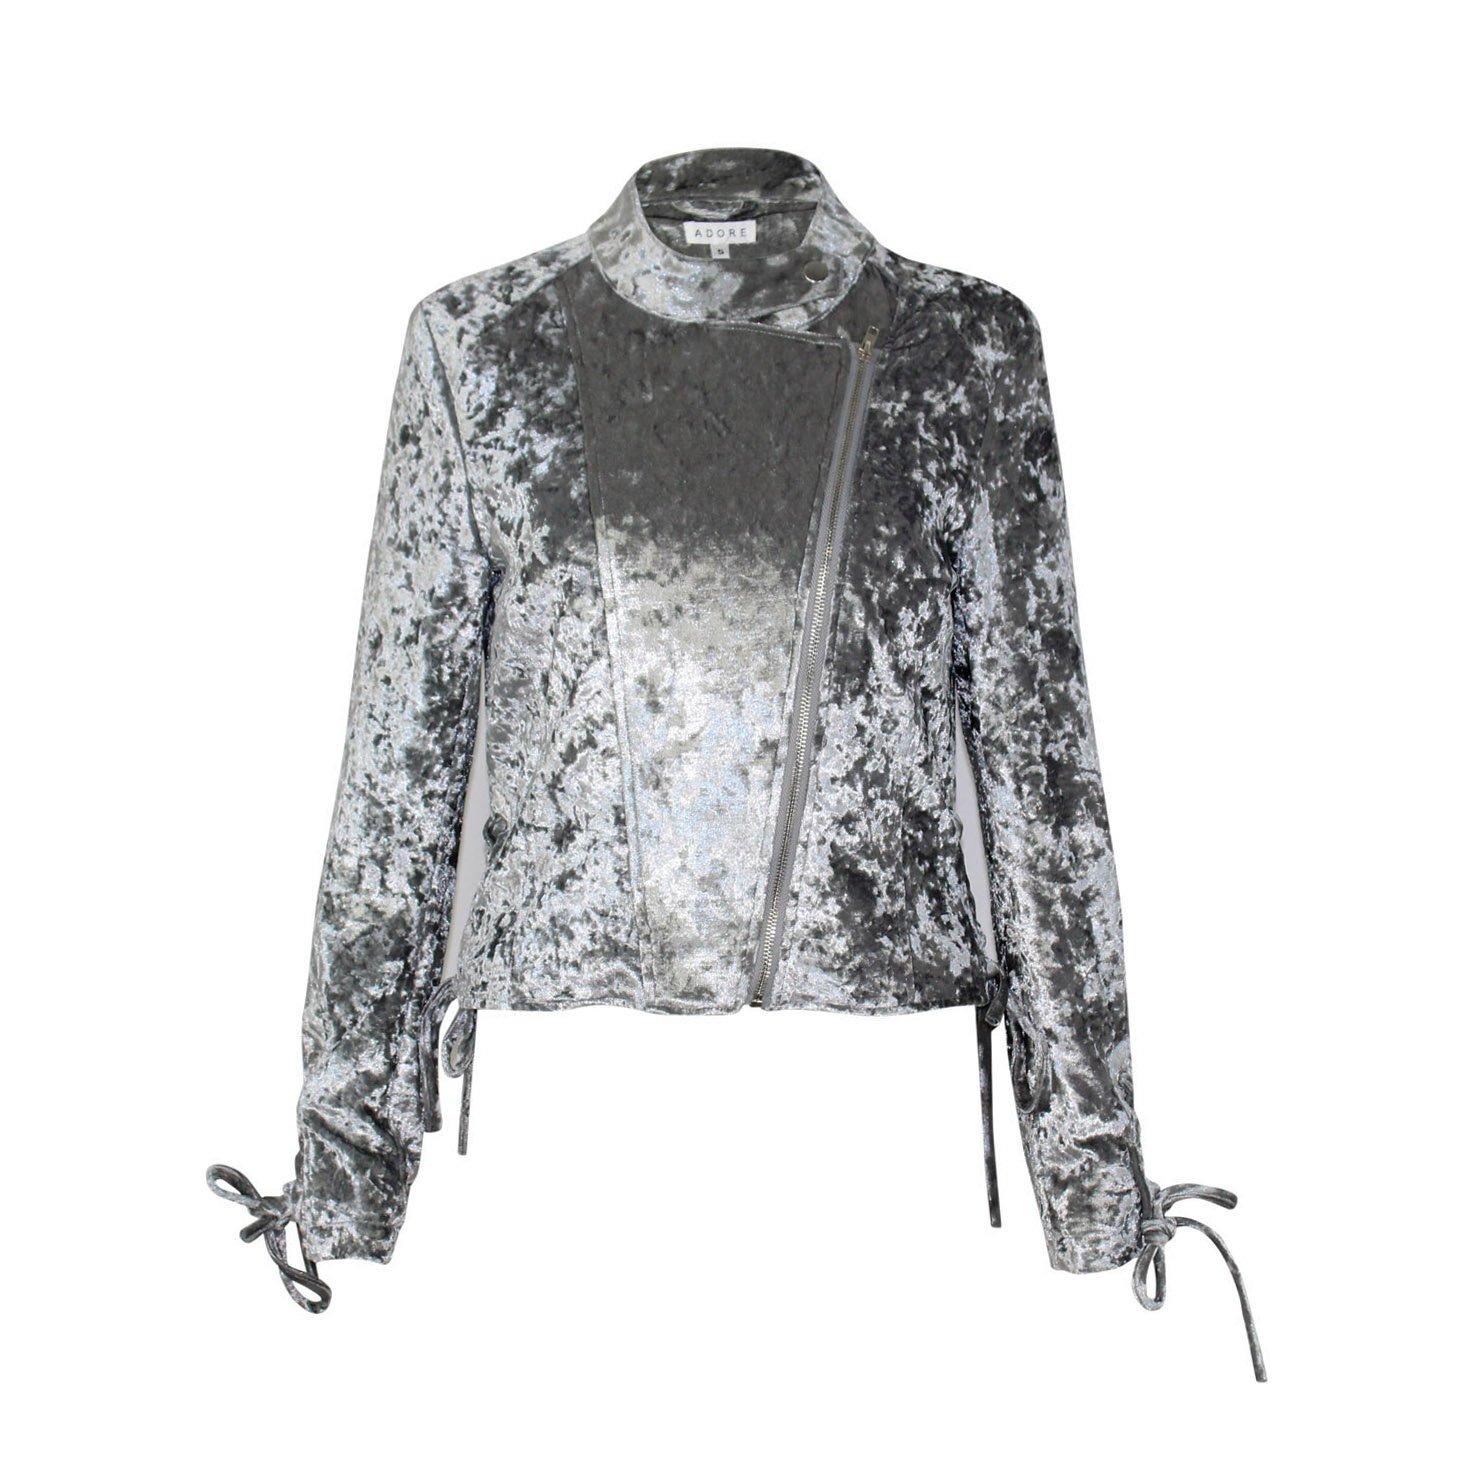 8826ef93ed29a Amazon.com  Adore Womens Crushed Velvet Moto Jacket Silver Small ...